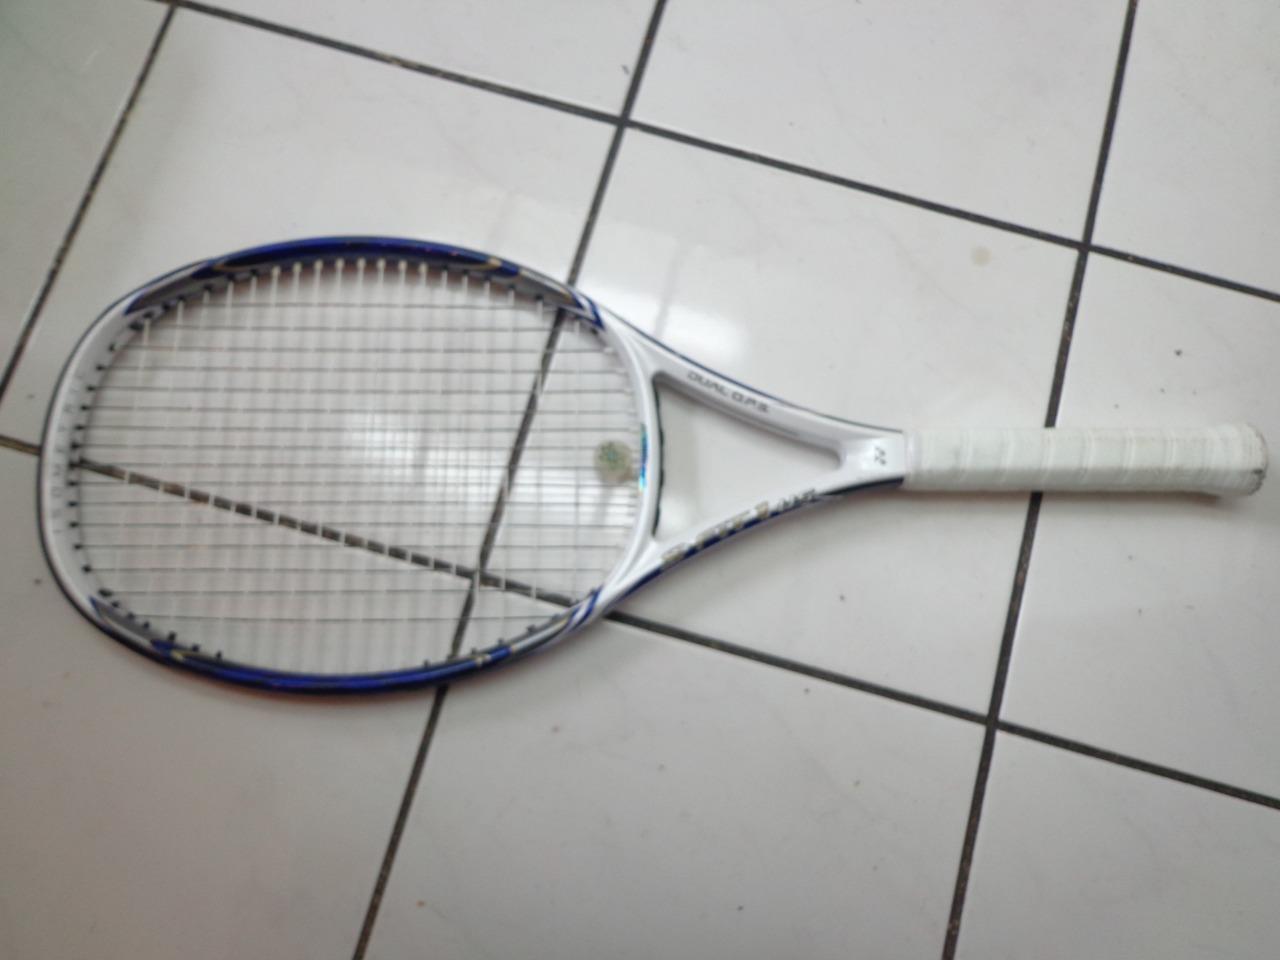 Yonex S Fit 1 100 cabeza 4 3 8 Grip Tenis Raqueta